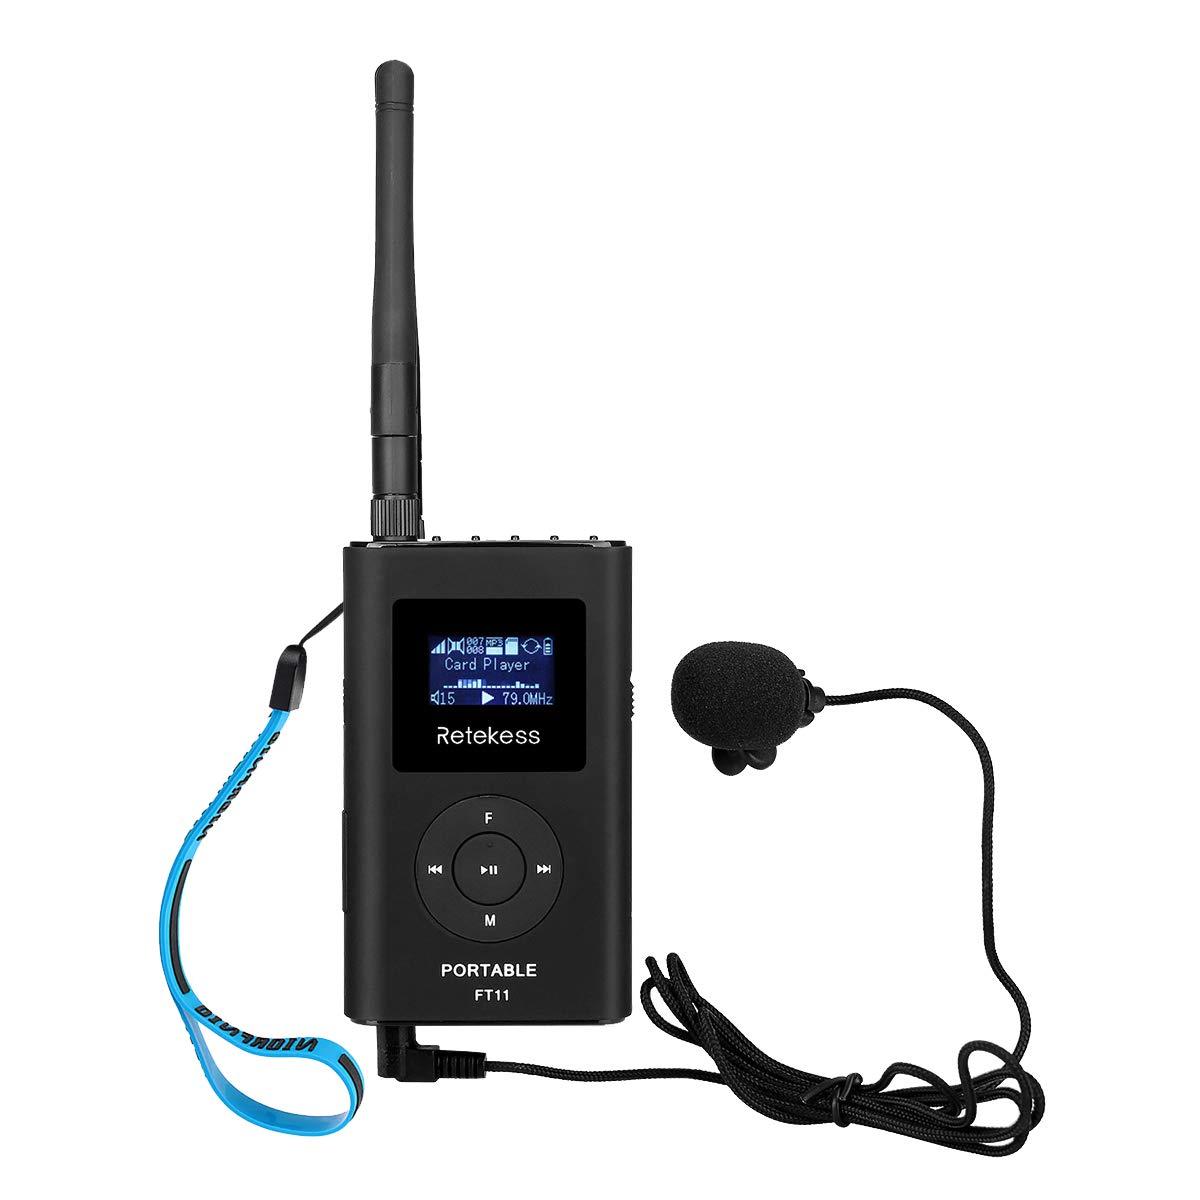 Retekess FT11 Portable FM Transmitter Low Power MP3 Broadcast Radio Station Power Support TF Card AUX Input for Church Translation by Retekess